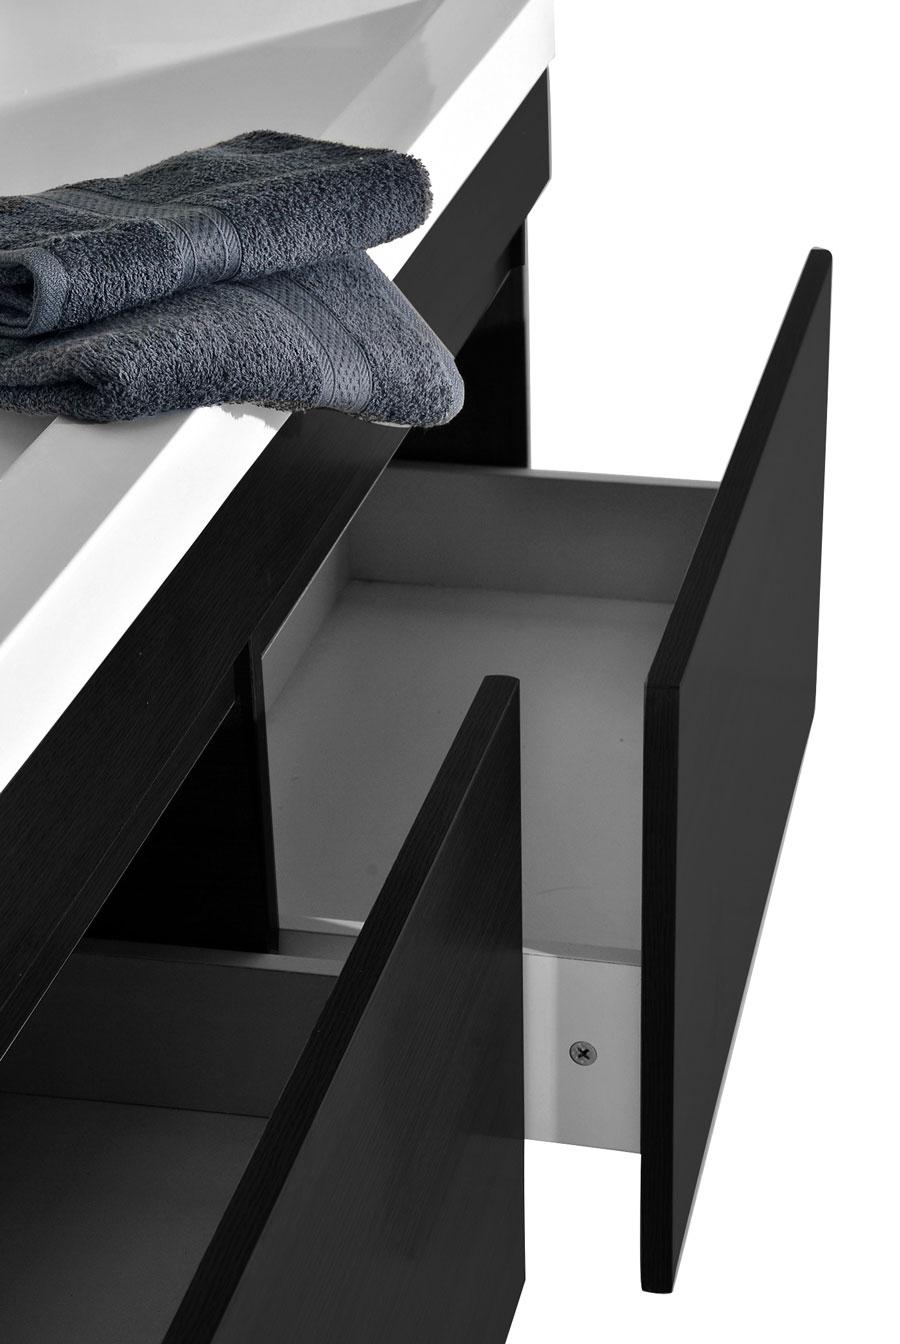 Sam® badmöbel 4tlg set schwarz hochglanz 140 cm parma deluxe